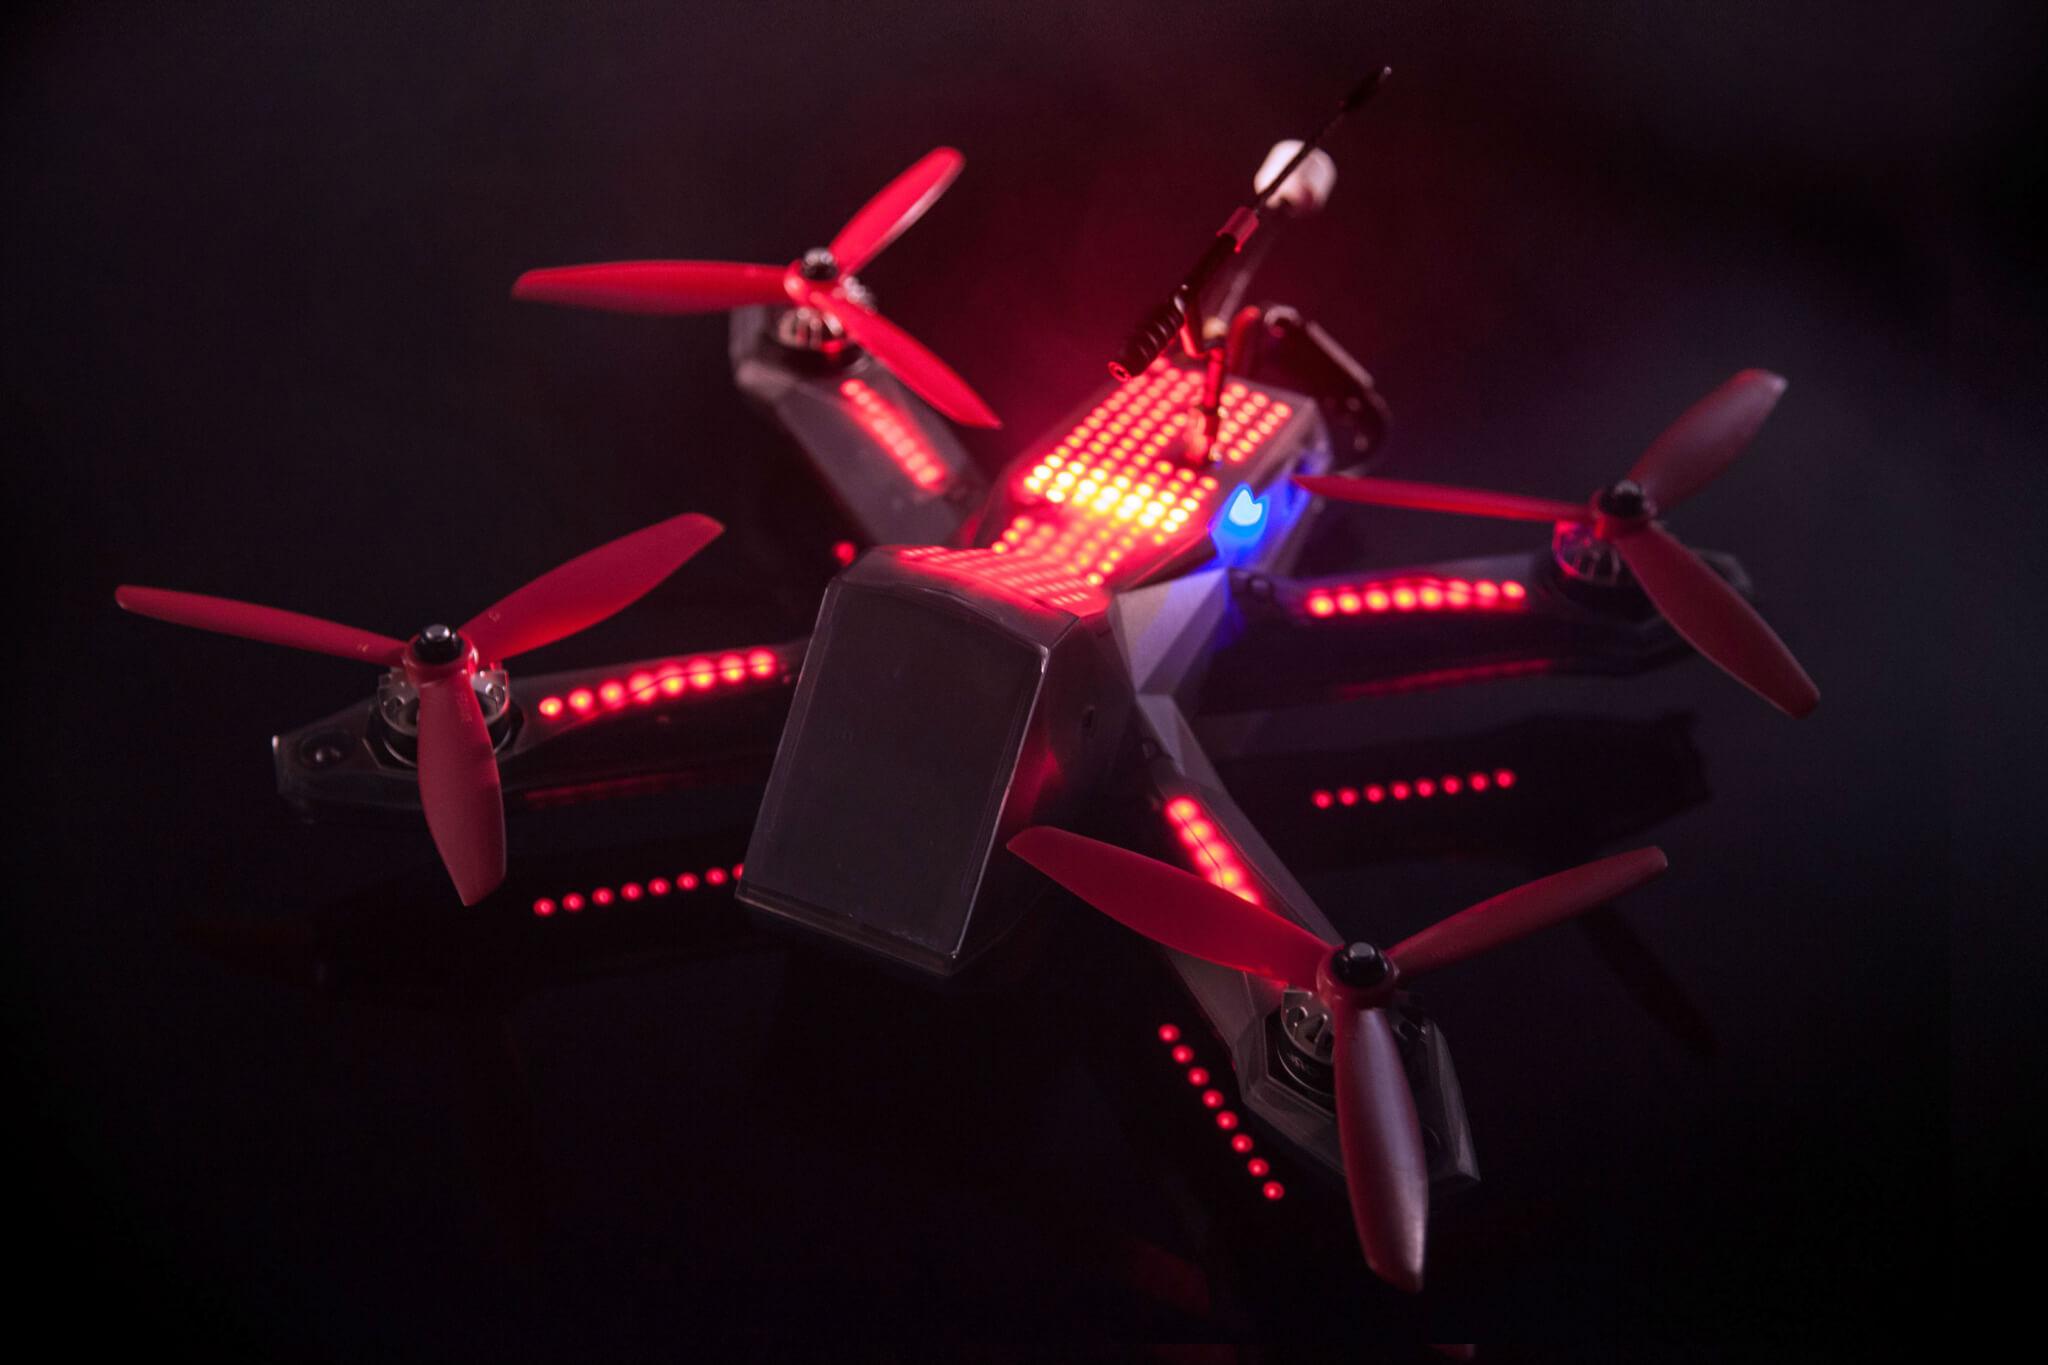 Racer 3 Drone Kaufen Drone Hd Wallpaper Regimageorg